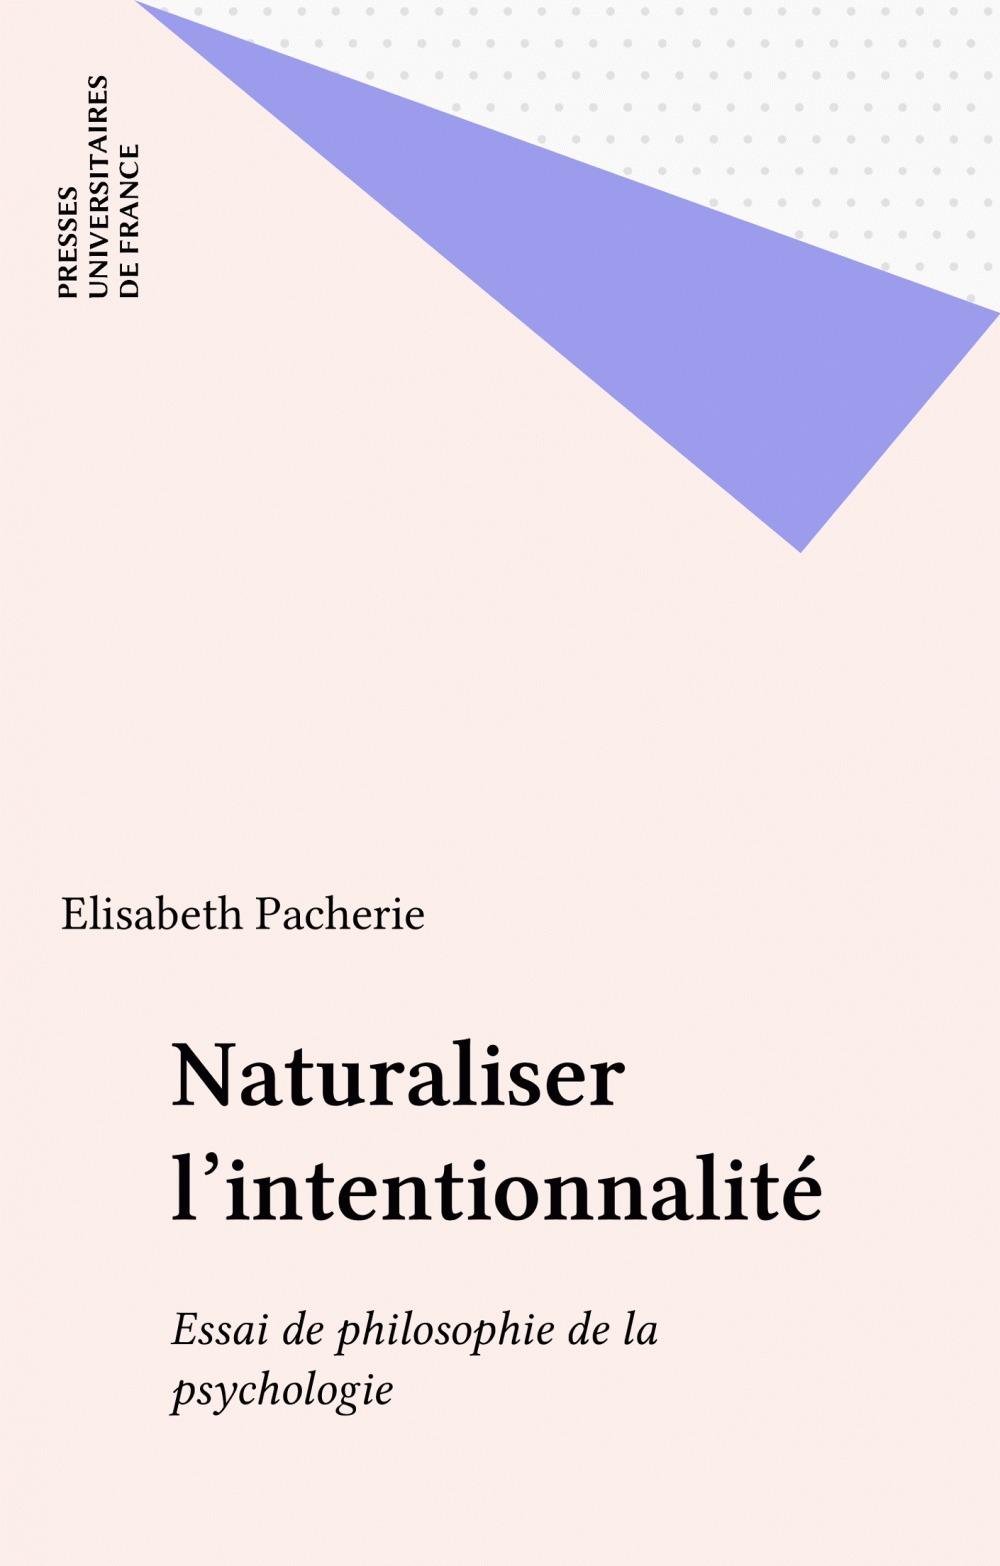 Naturaliser l'intentionnalite